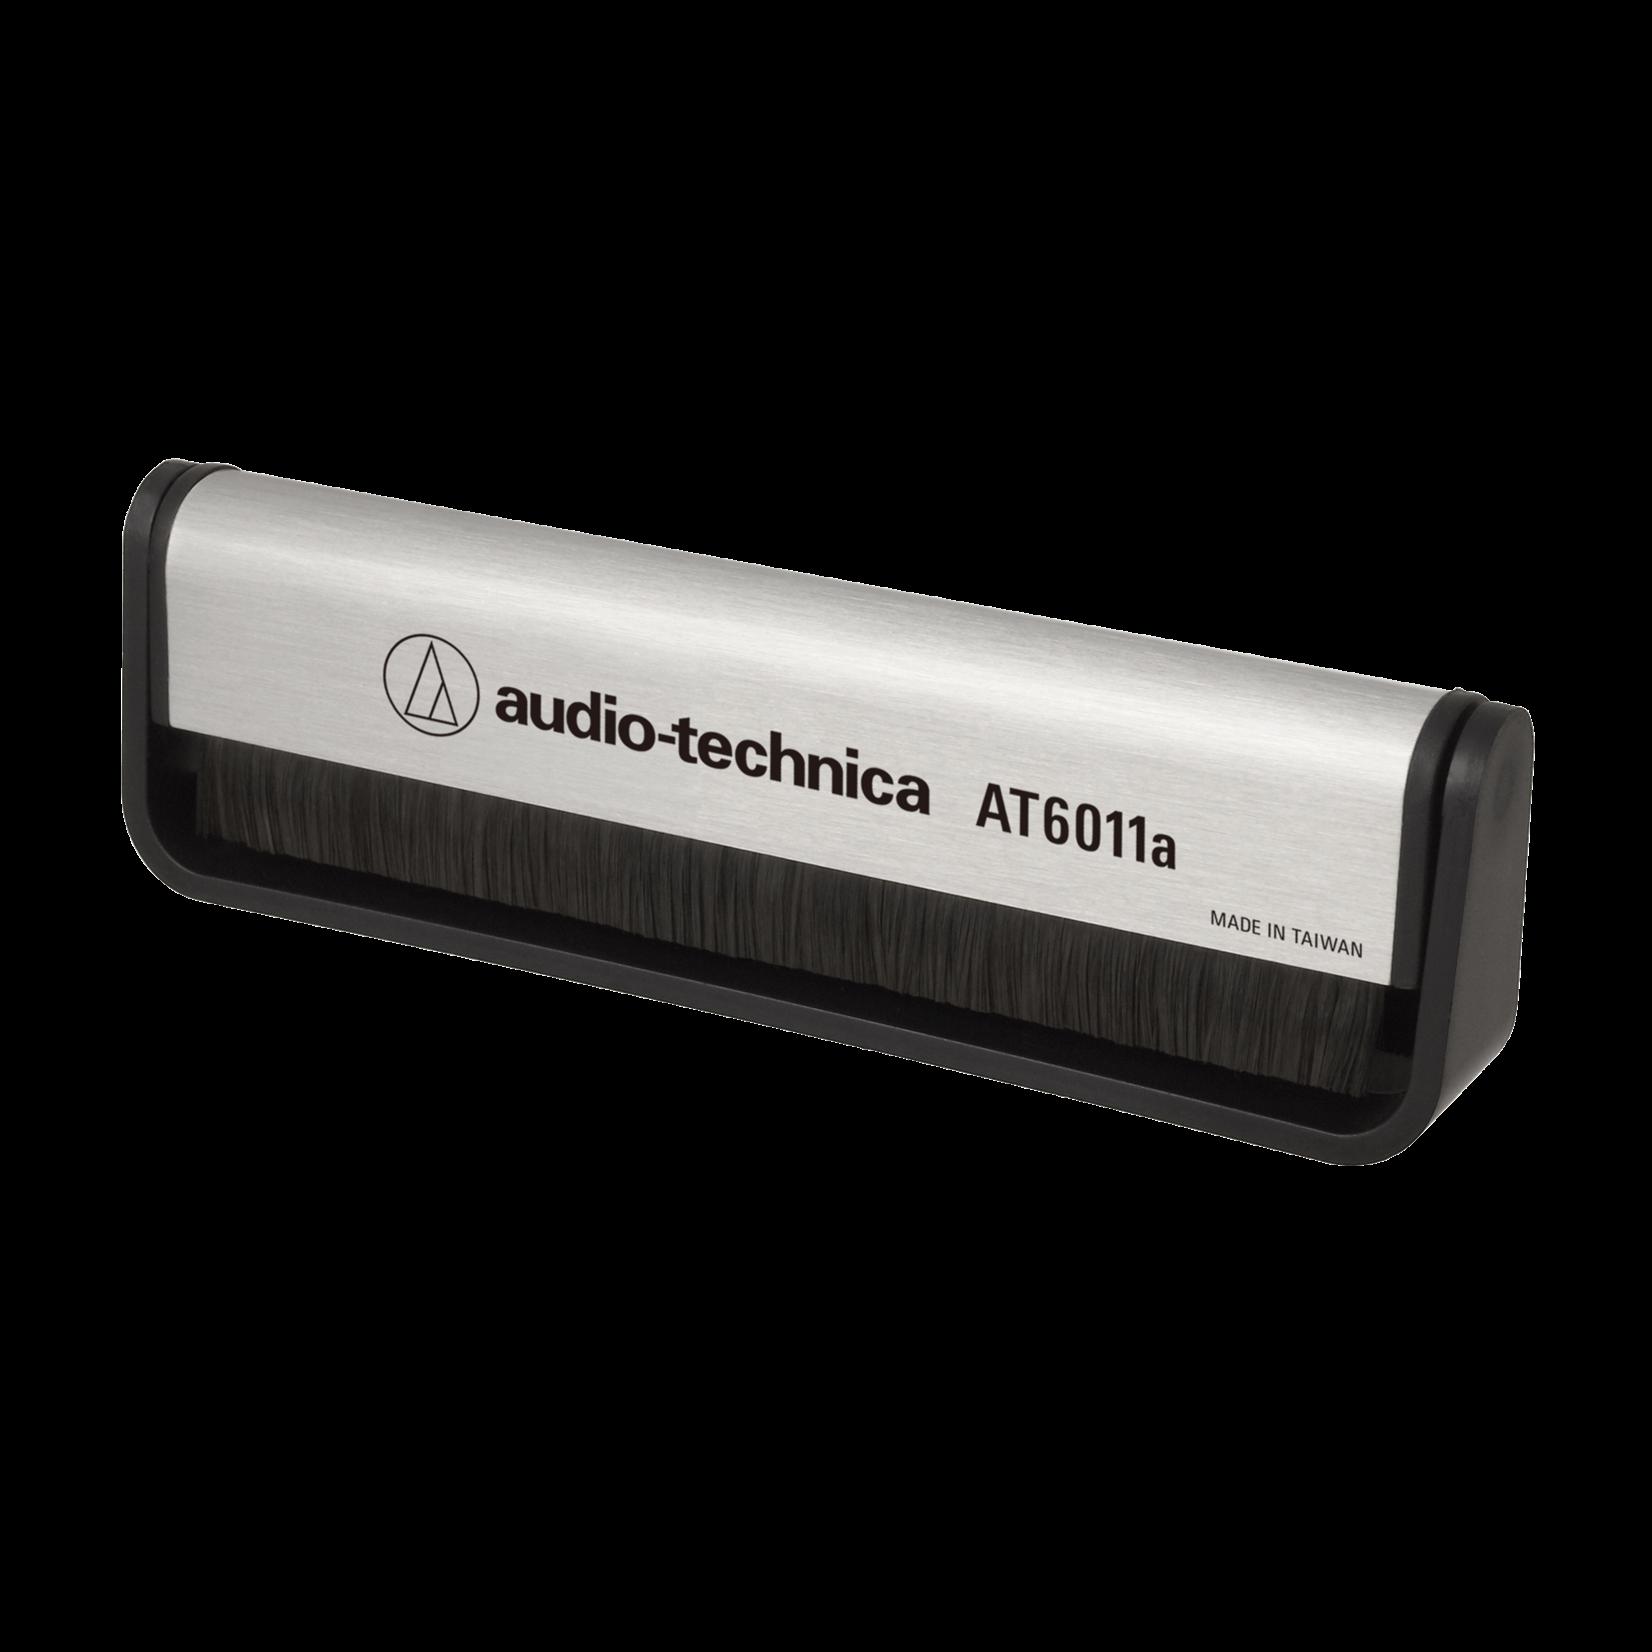 AUDIO-TECHNICA AT6011A ANTI-STATIC RECORD BRUSH